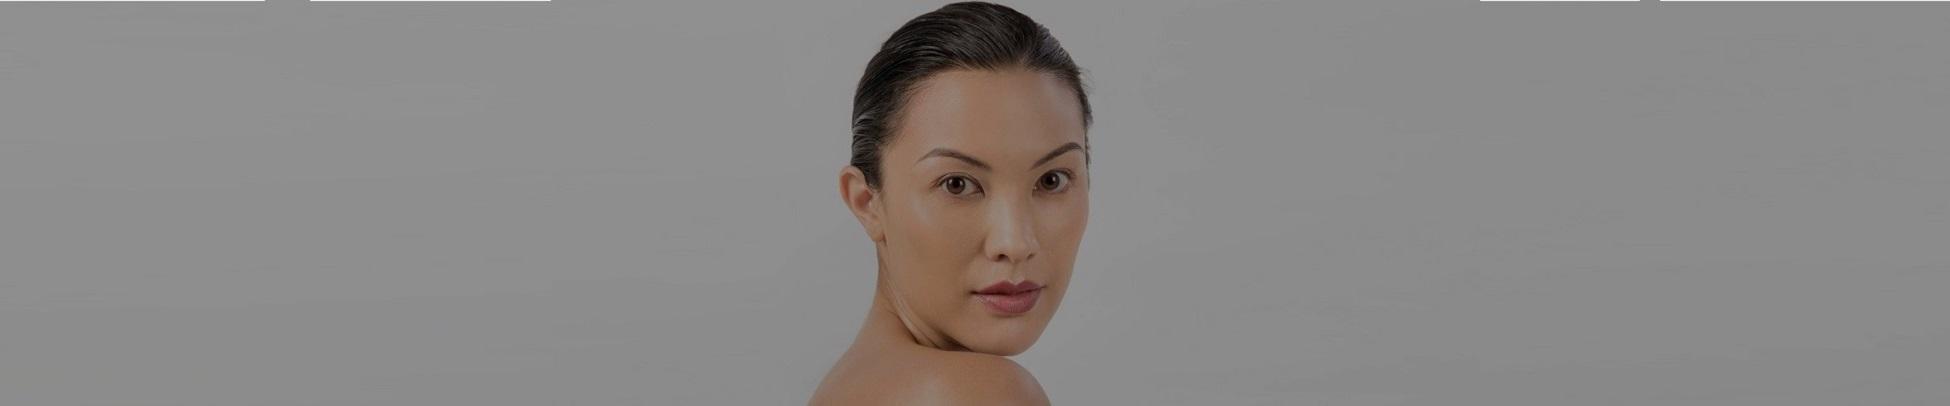 Science On Skin |